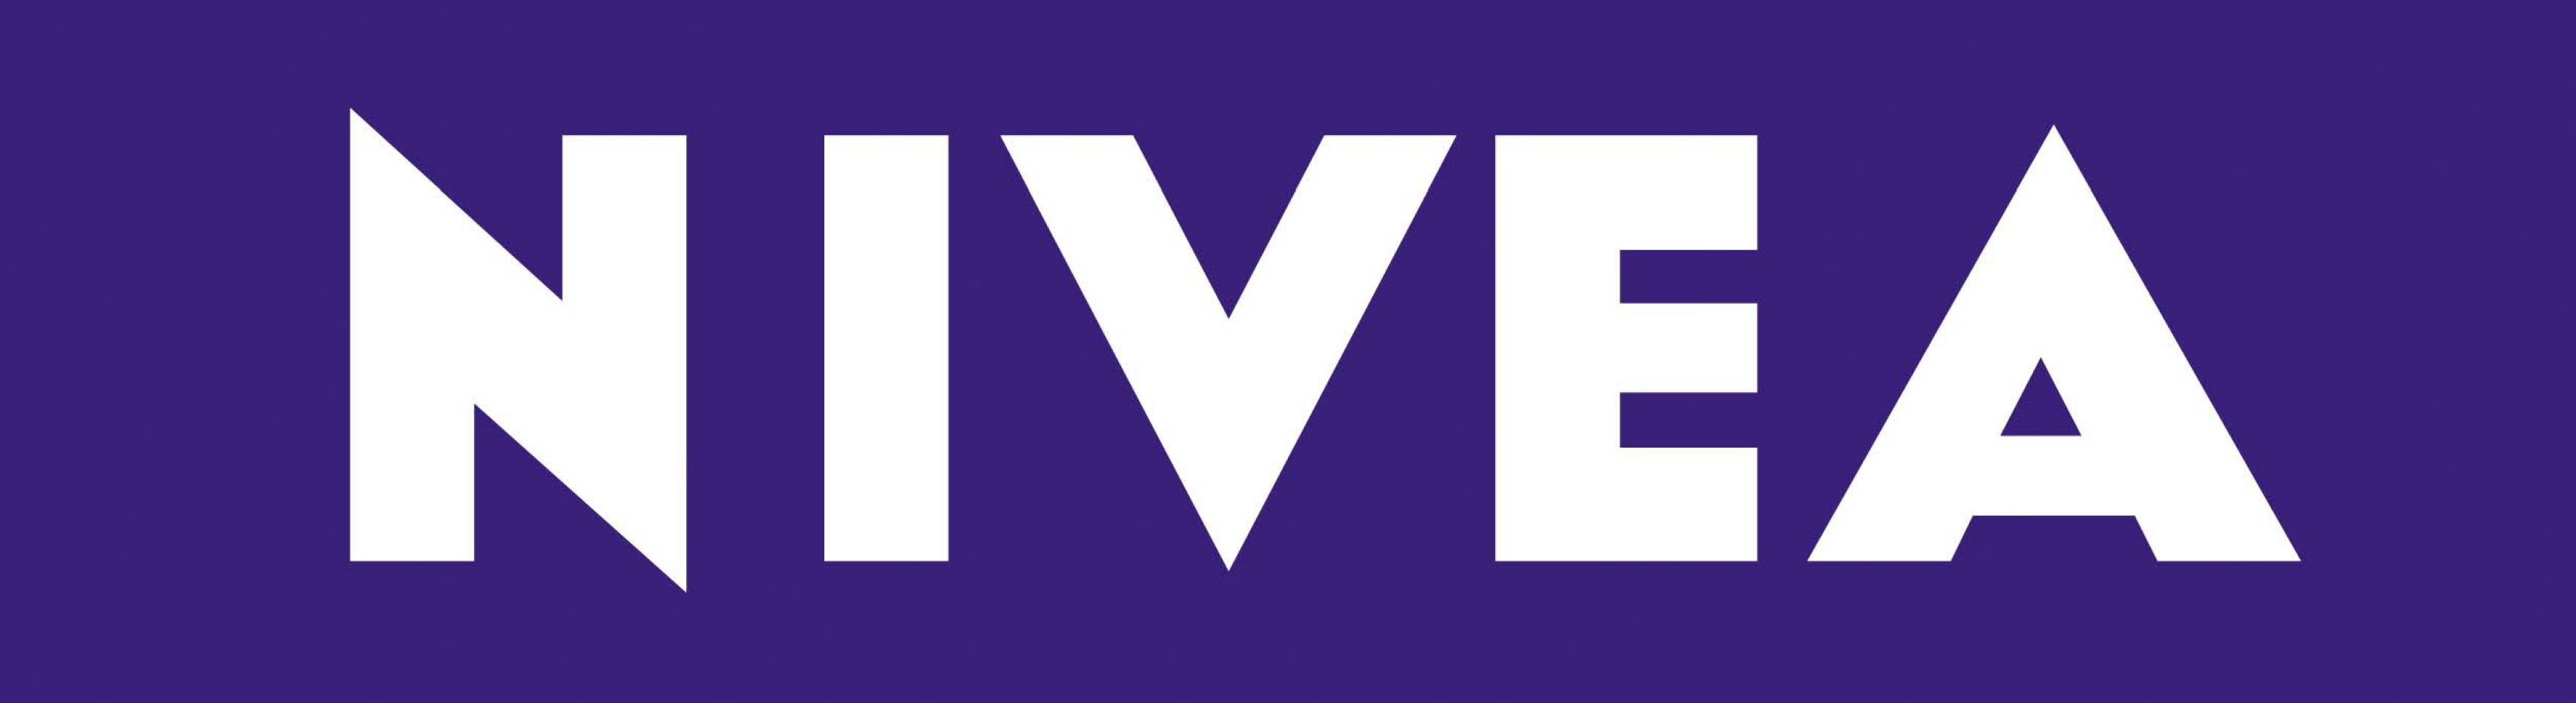 Nivea Logo png